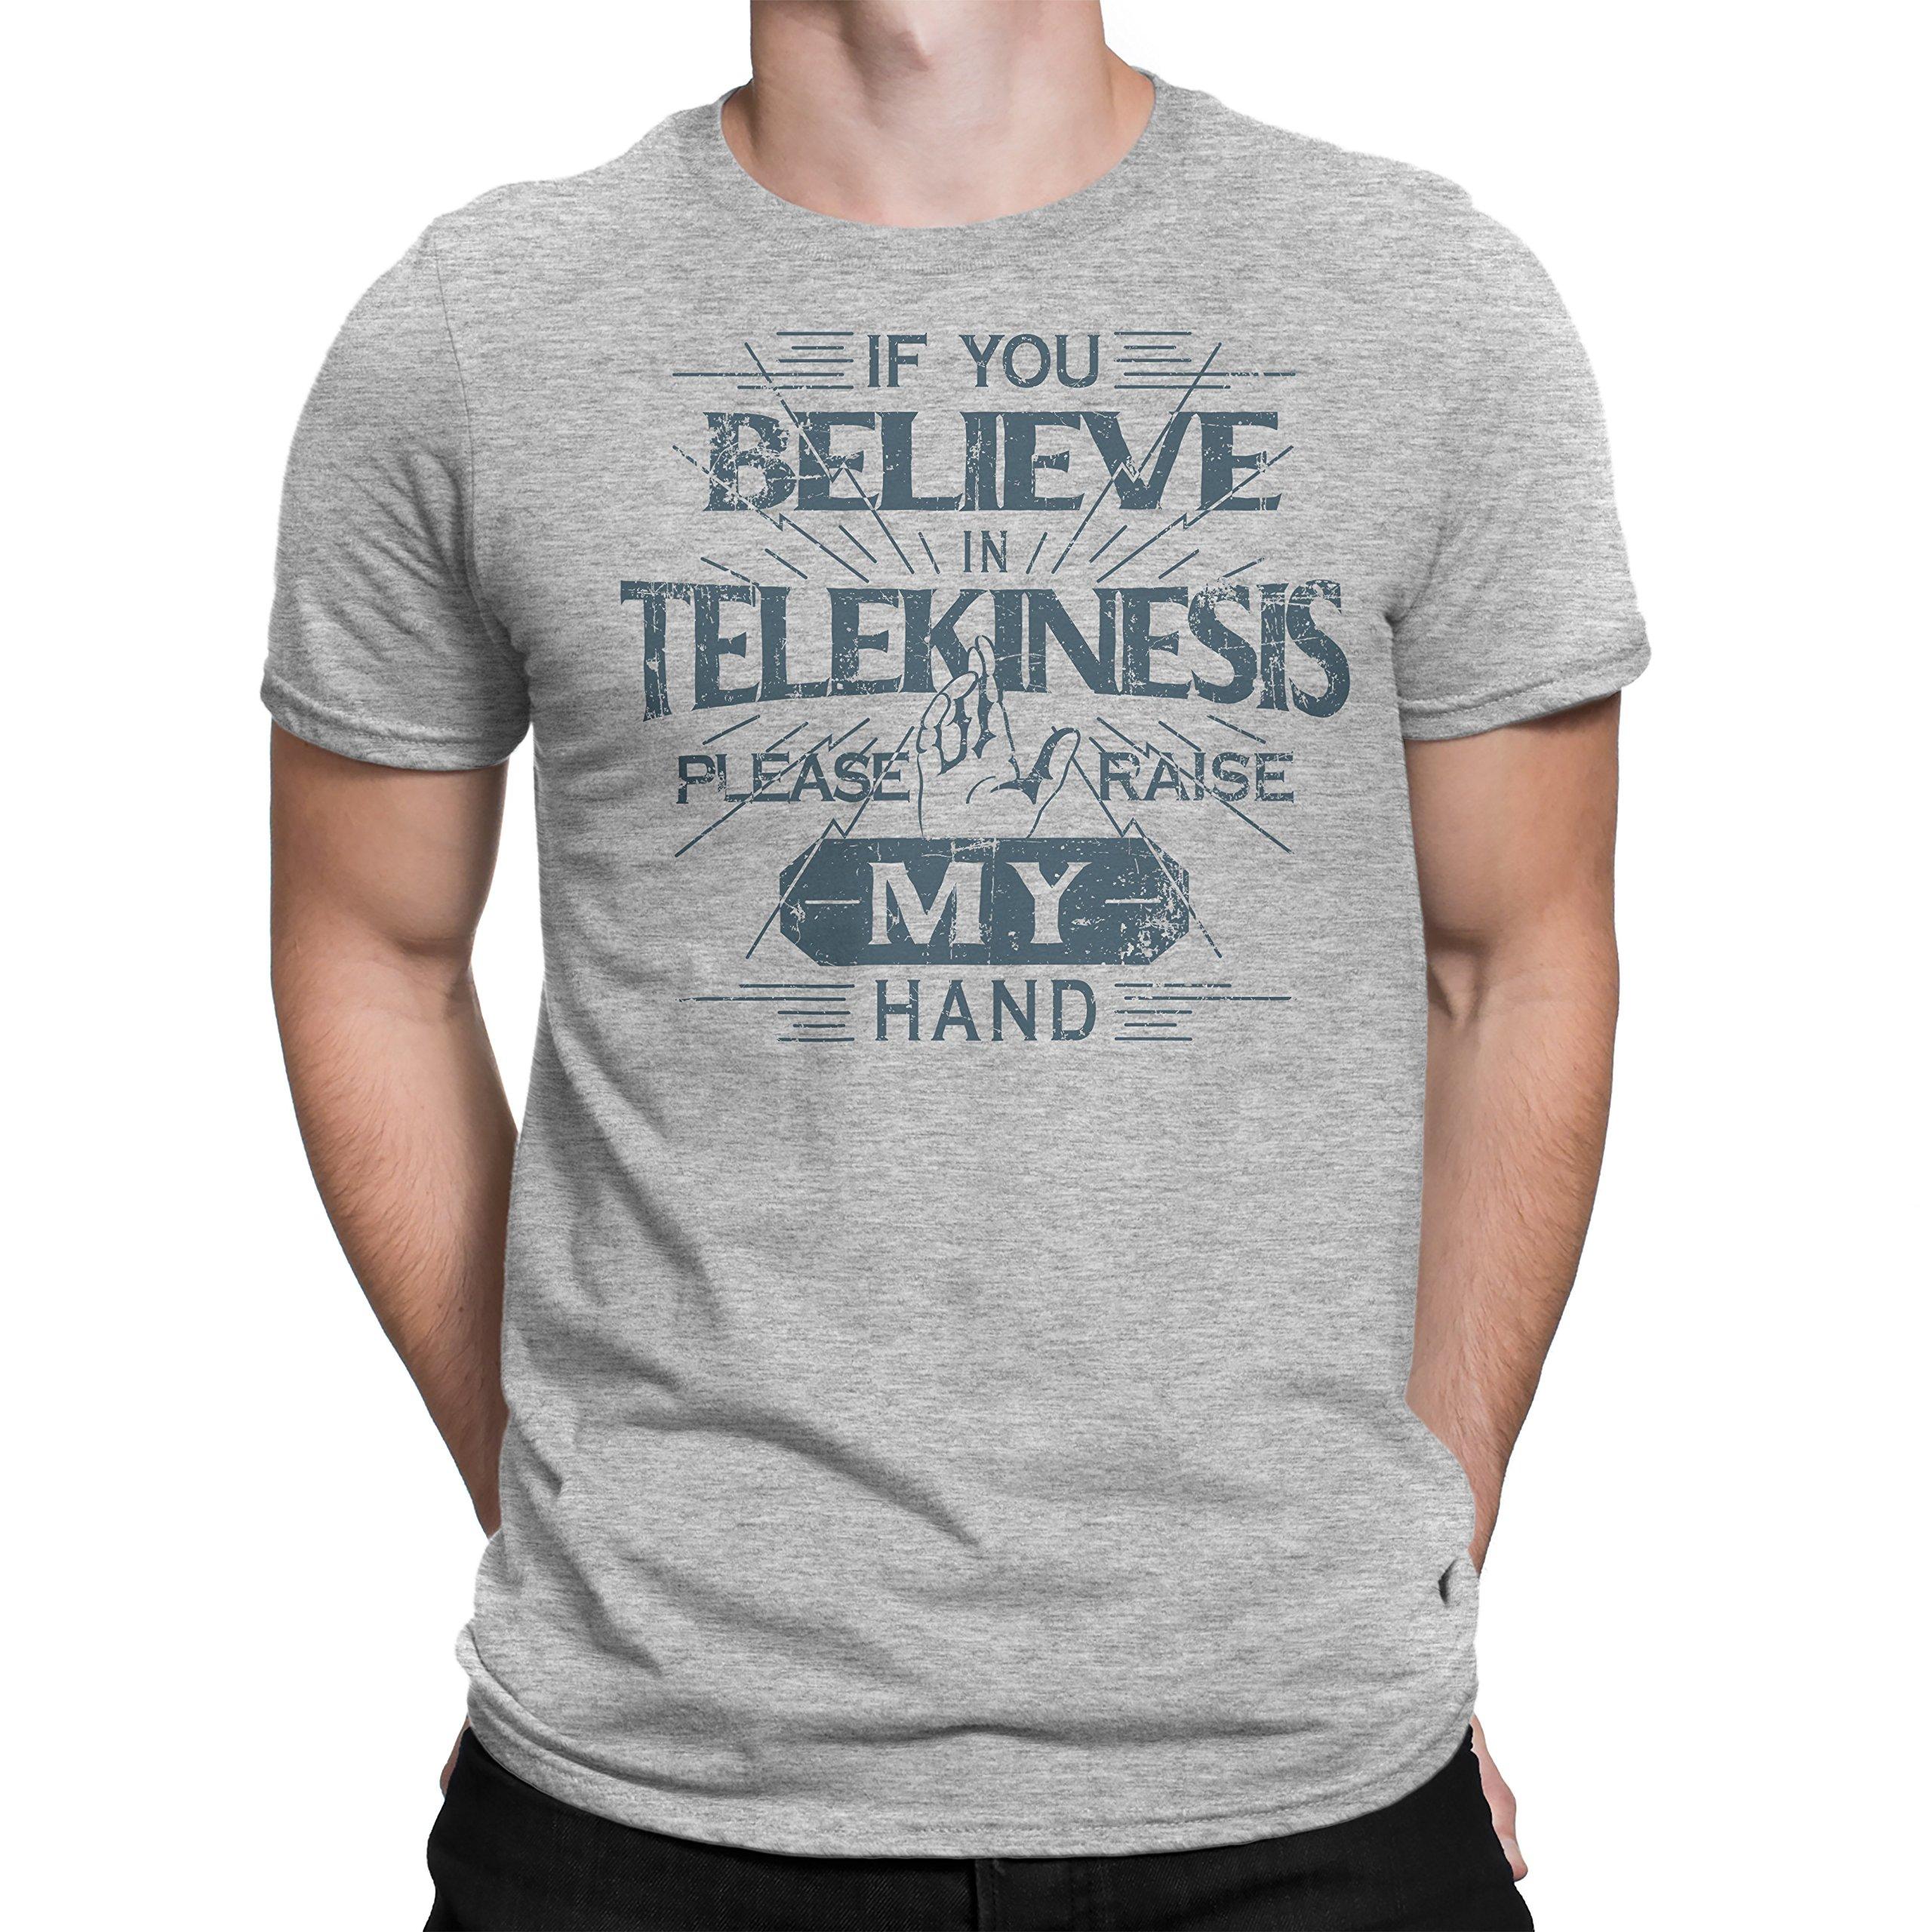 cdefc806 Cellblock 1138 Spiderman: Homecoming Inspired If You Believe in  Telekinesis. Shirt